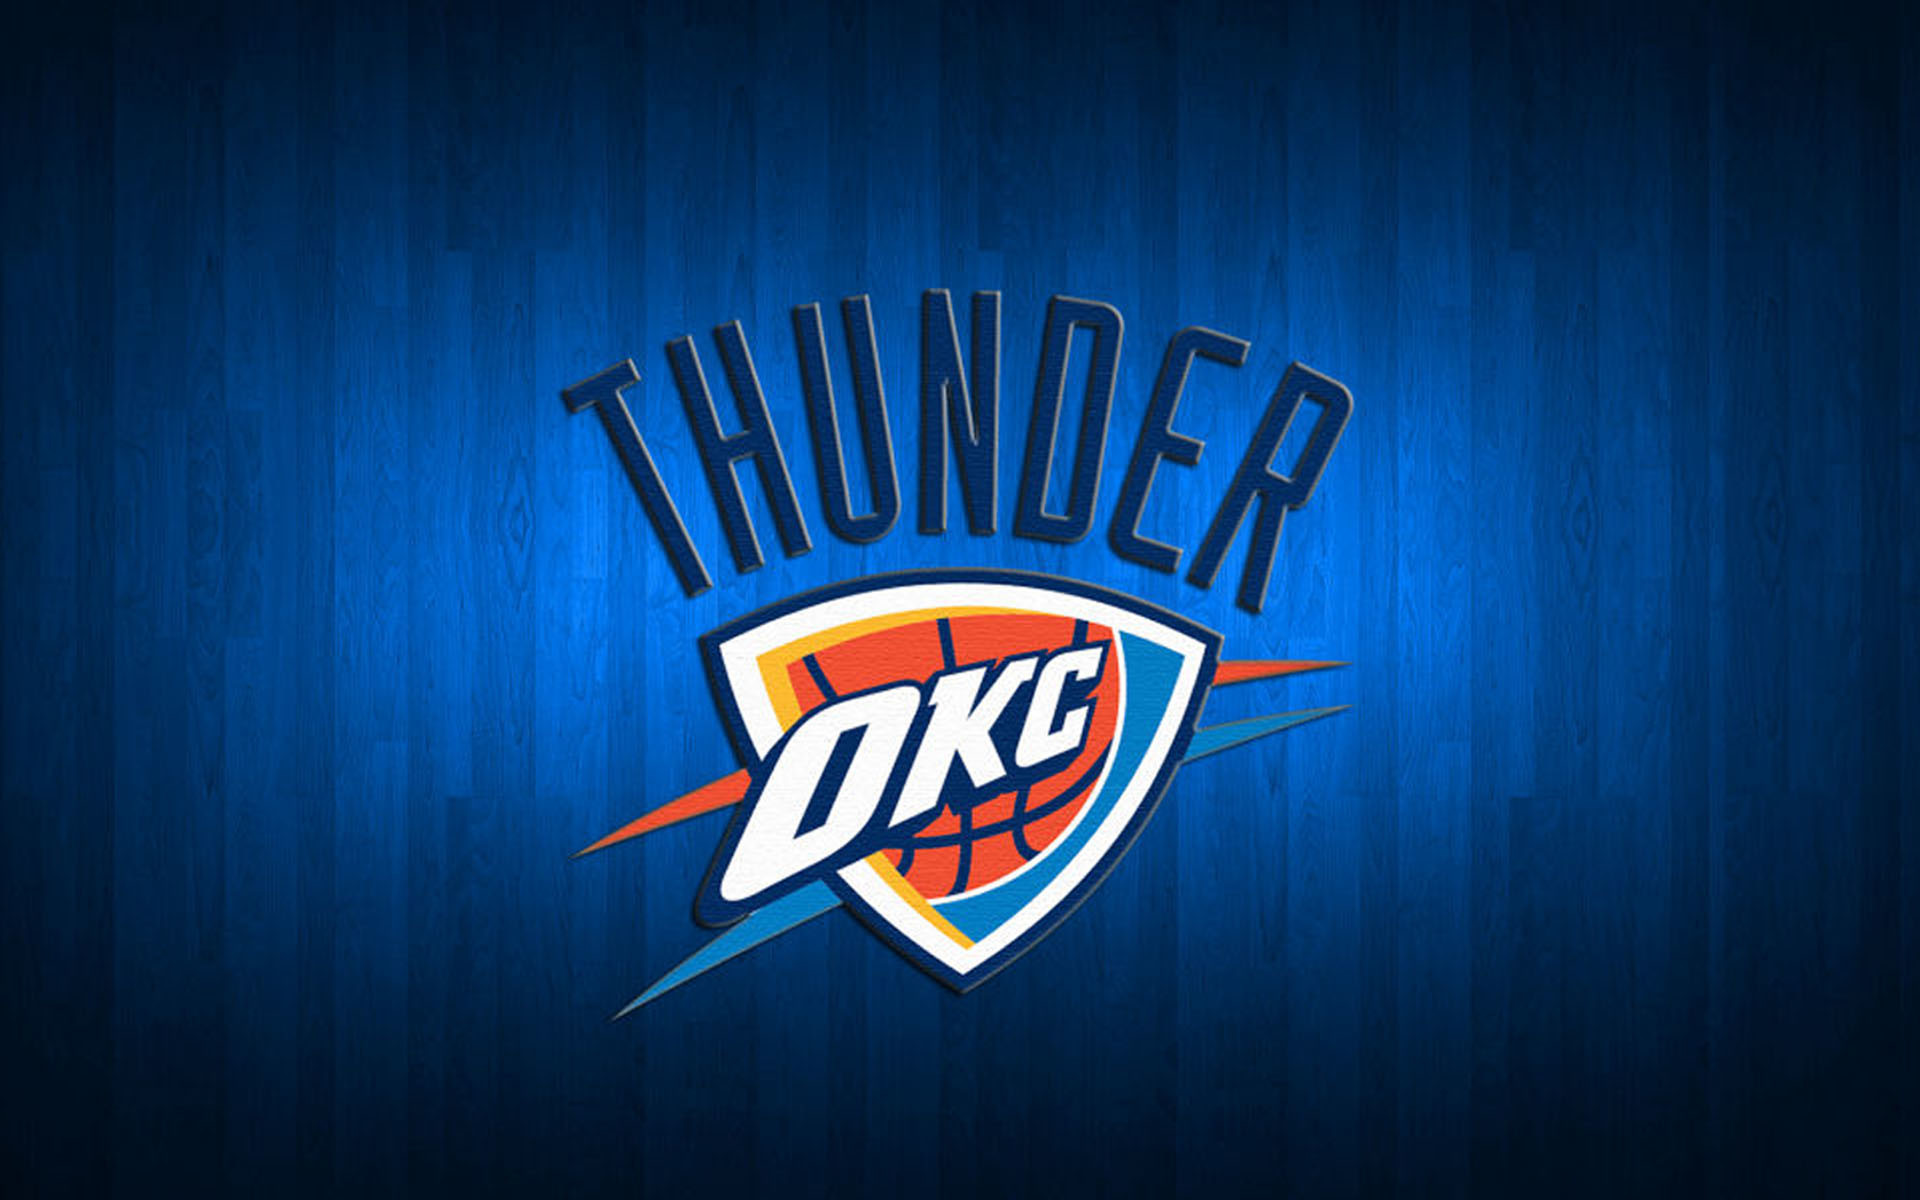 NBA Team Logos Wallpaper 2018 (71+ images).